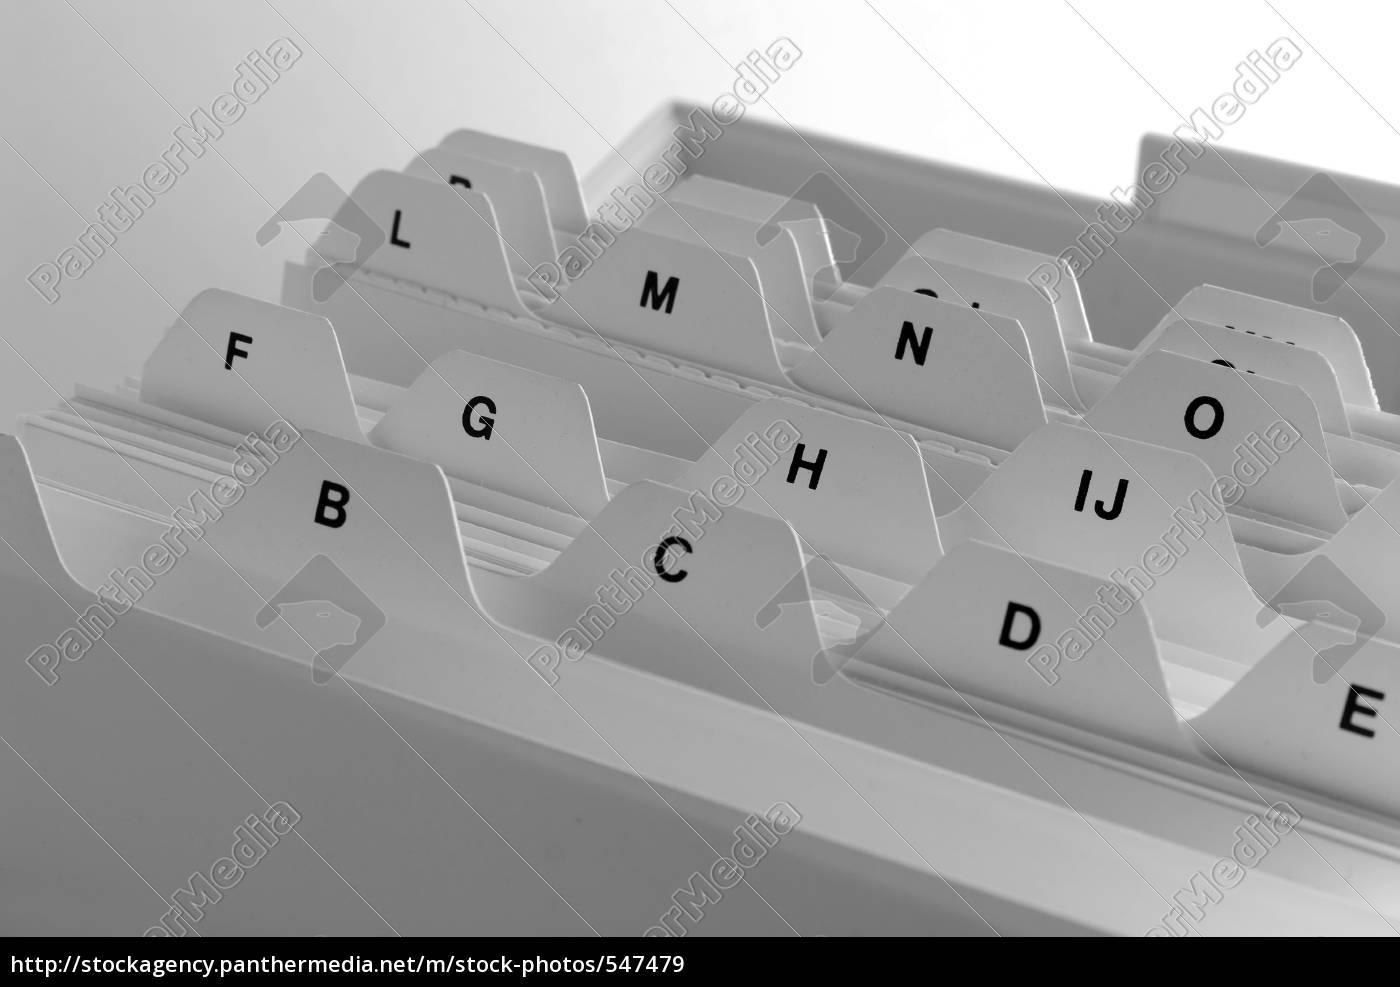 card, file - 547479